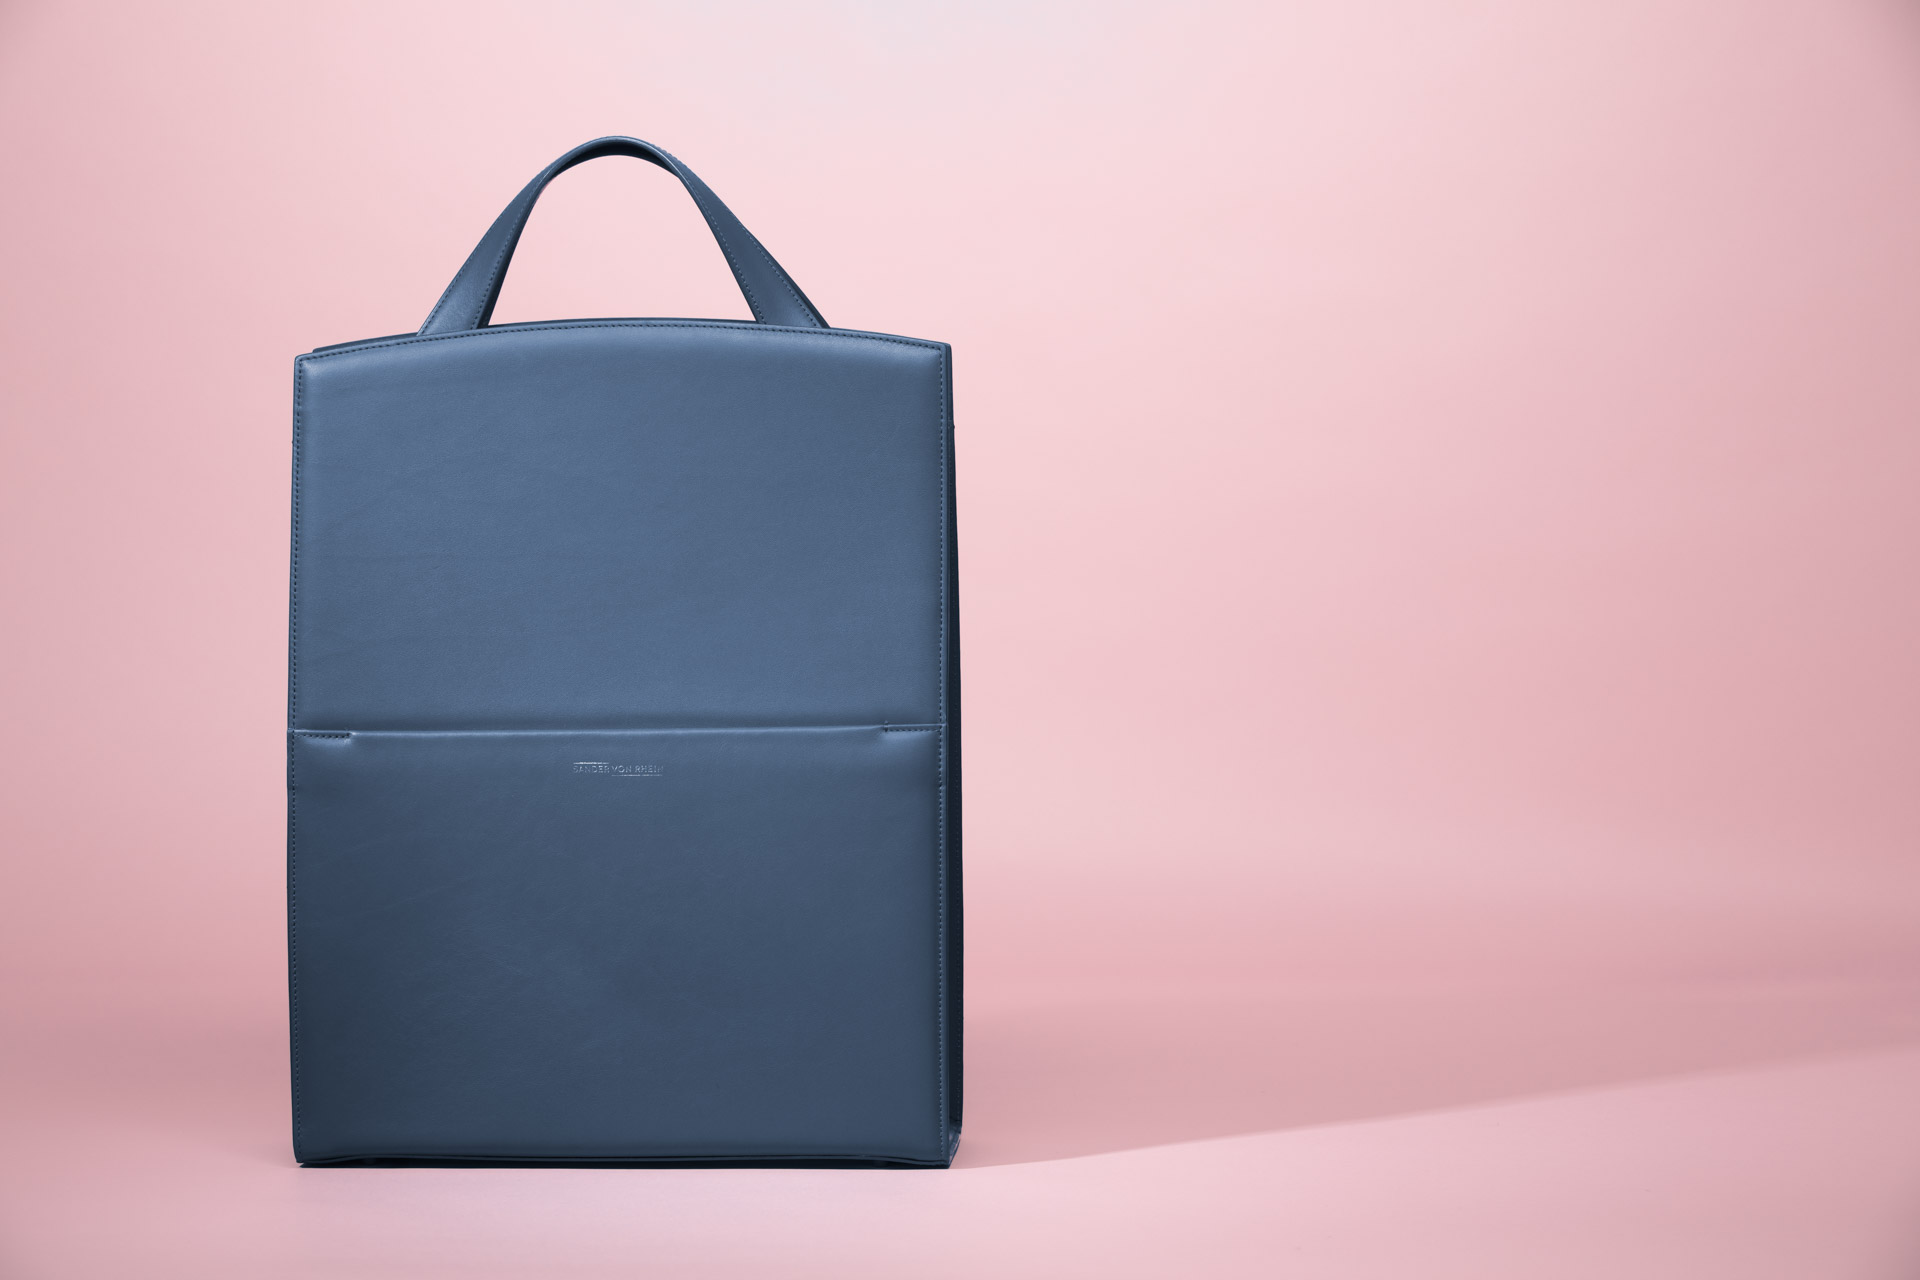 WEB Backup bags shop presentation-25.jpg